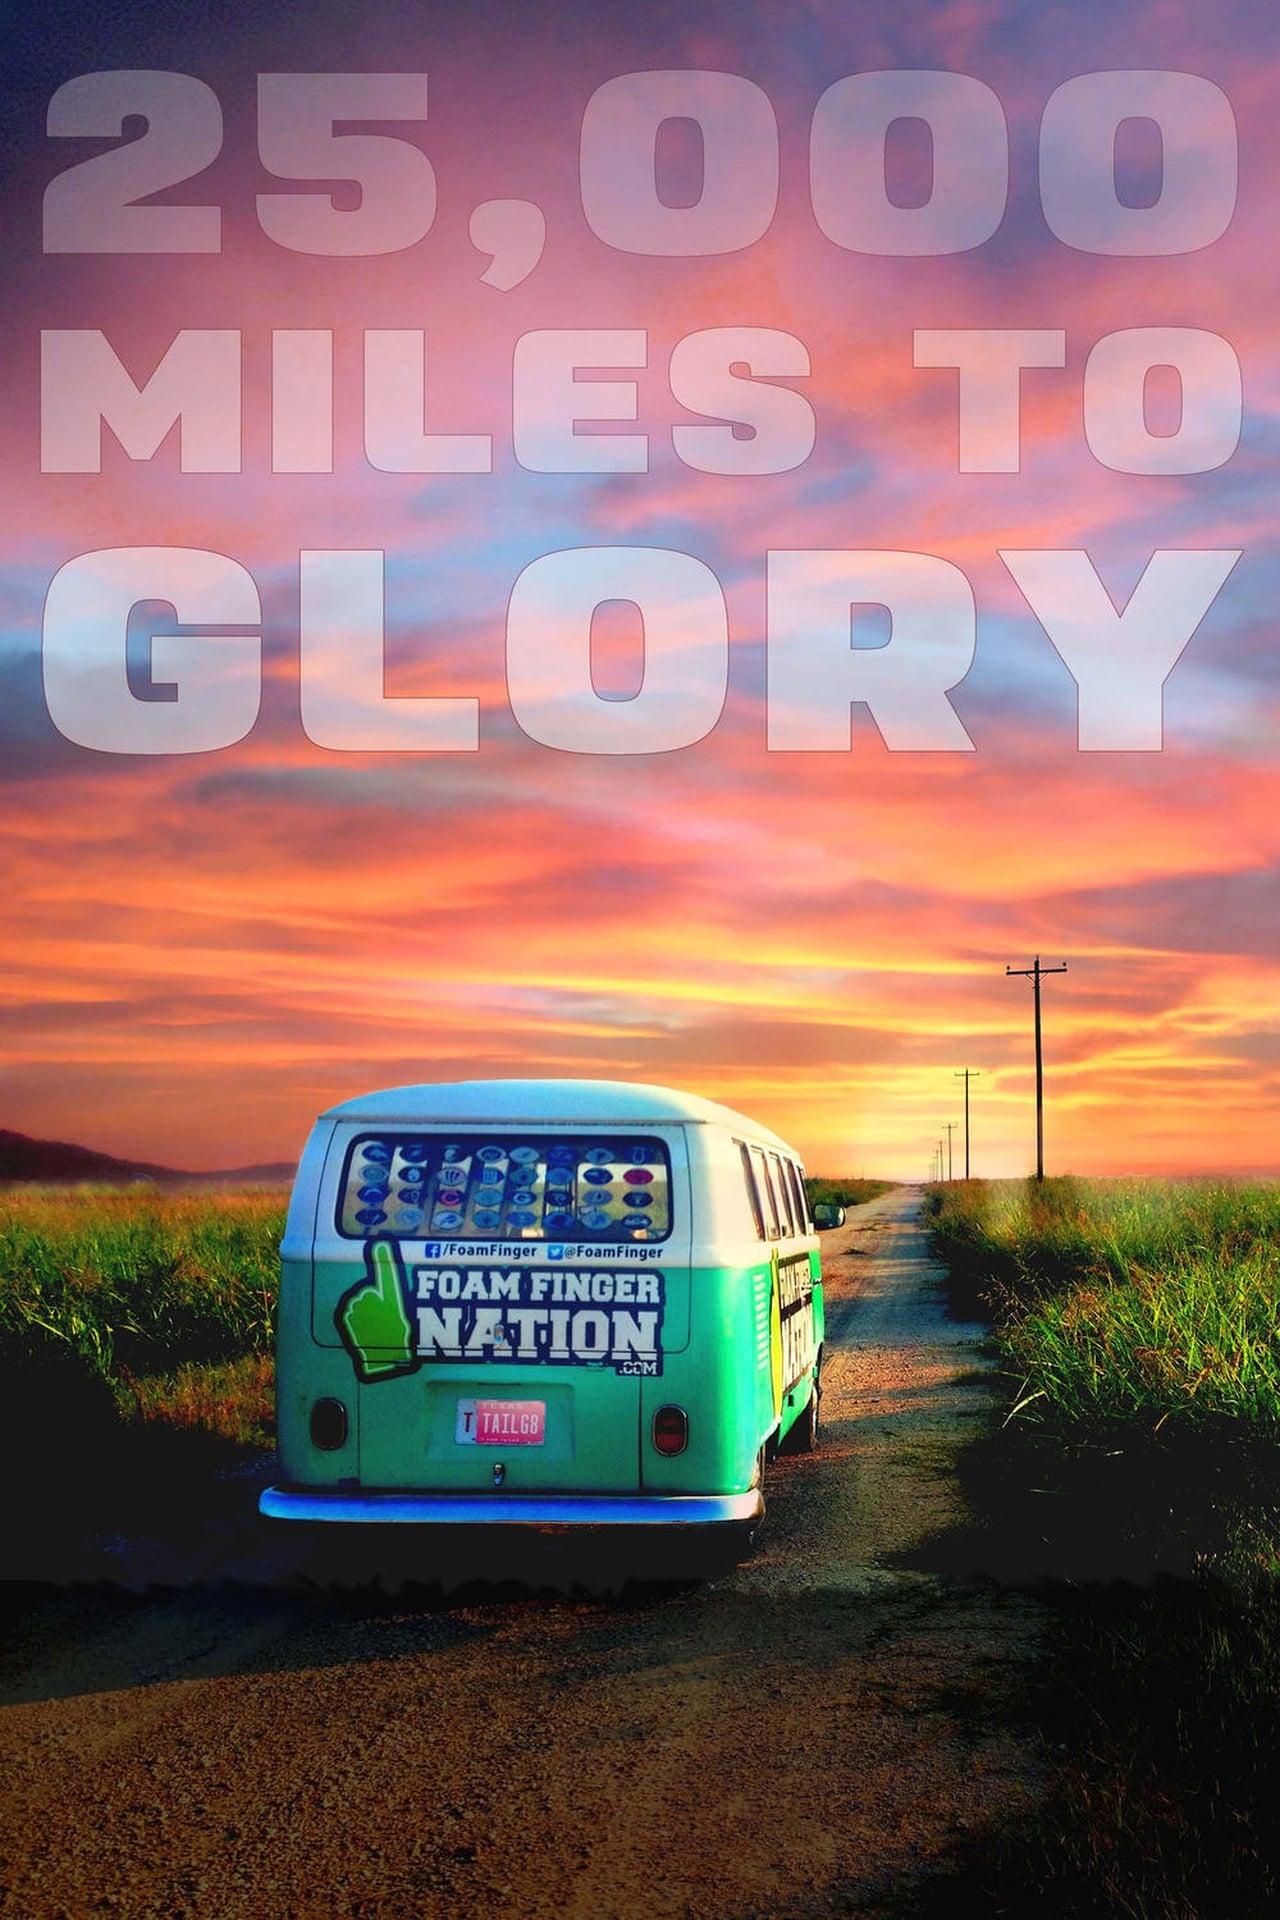 25,000 Miles to Glory